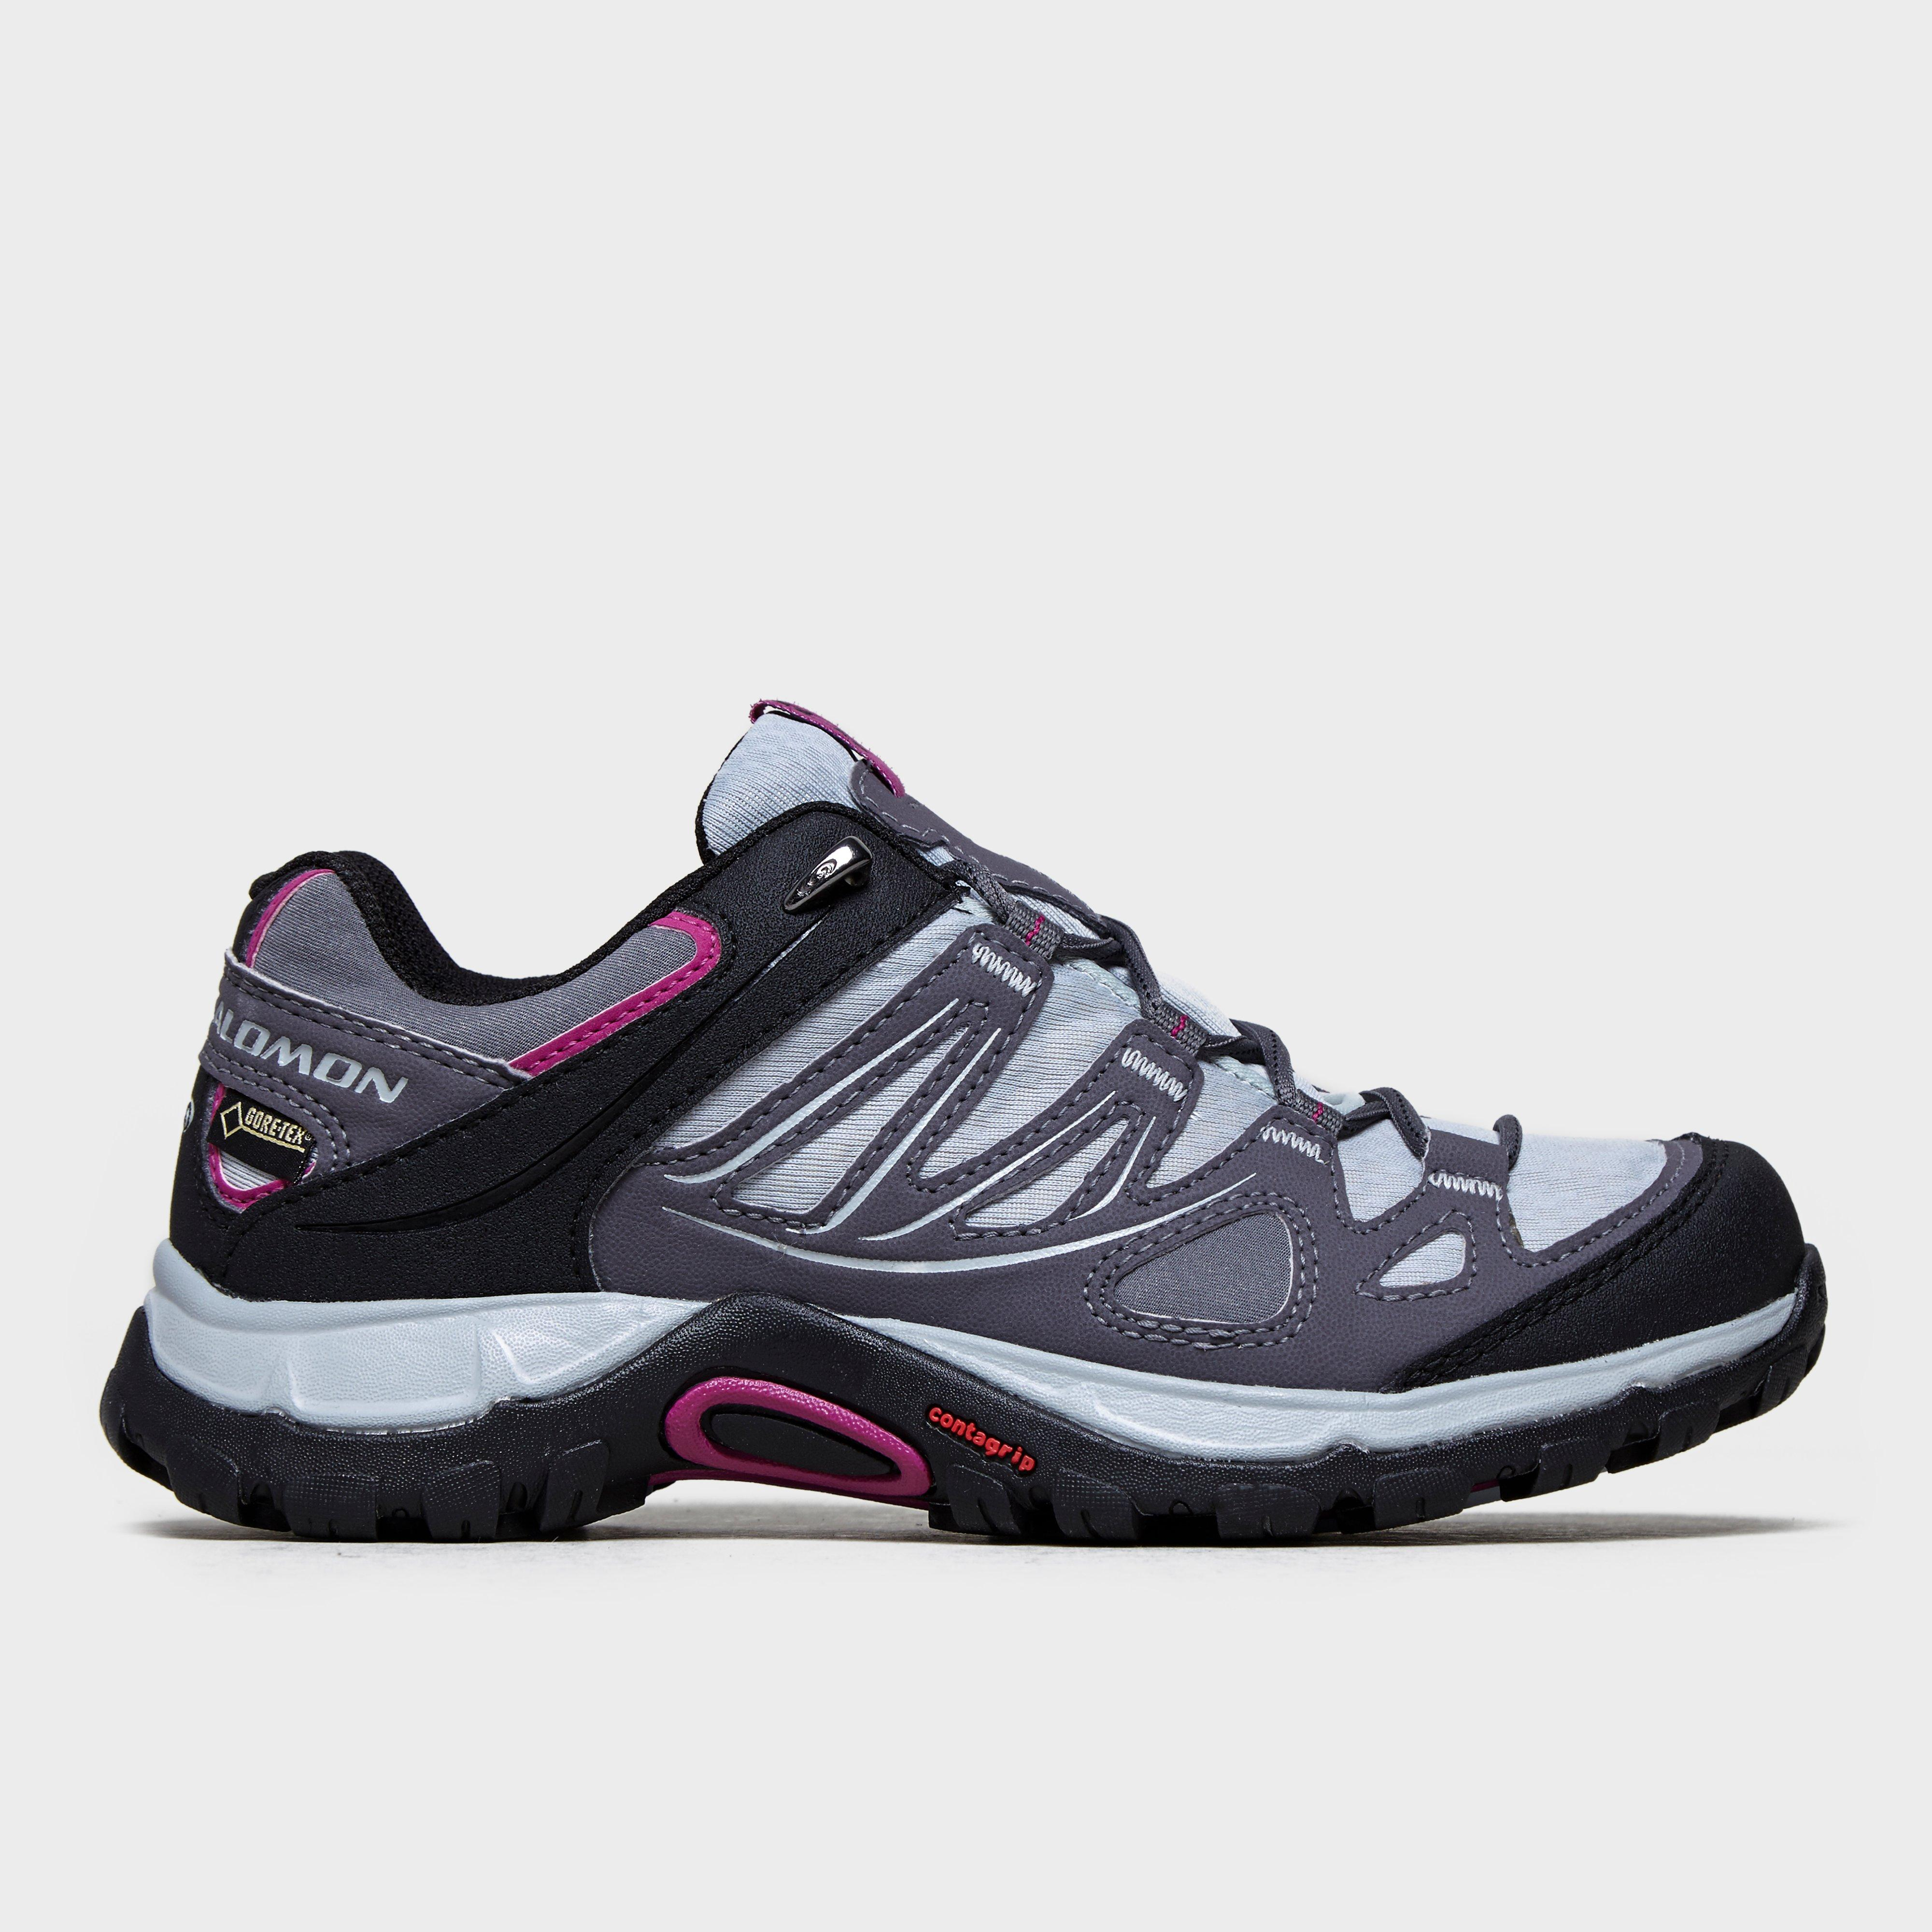 Womens Running Shoes Salomon